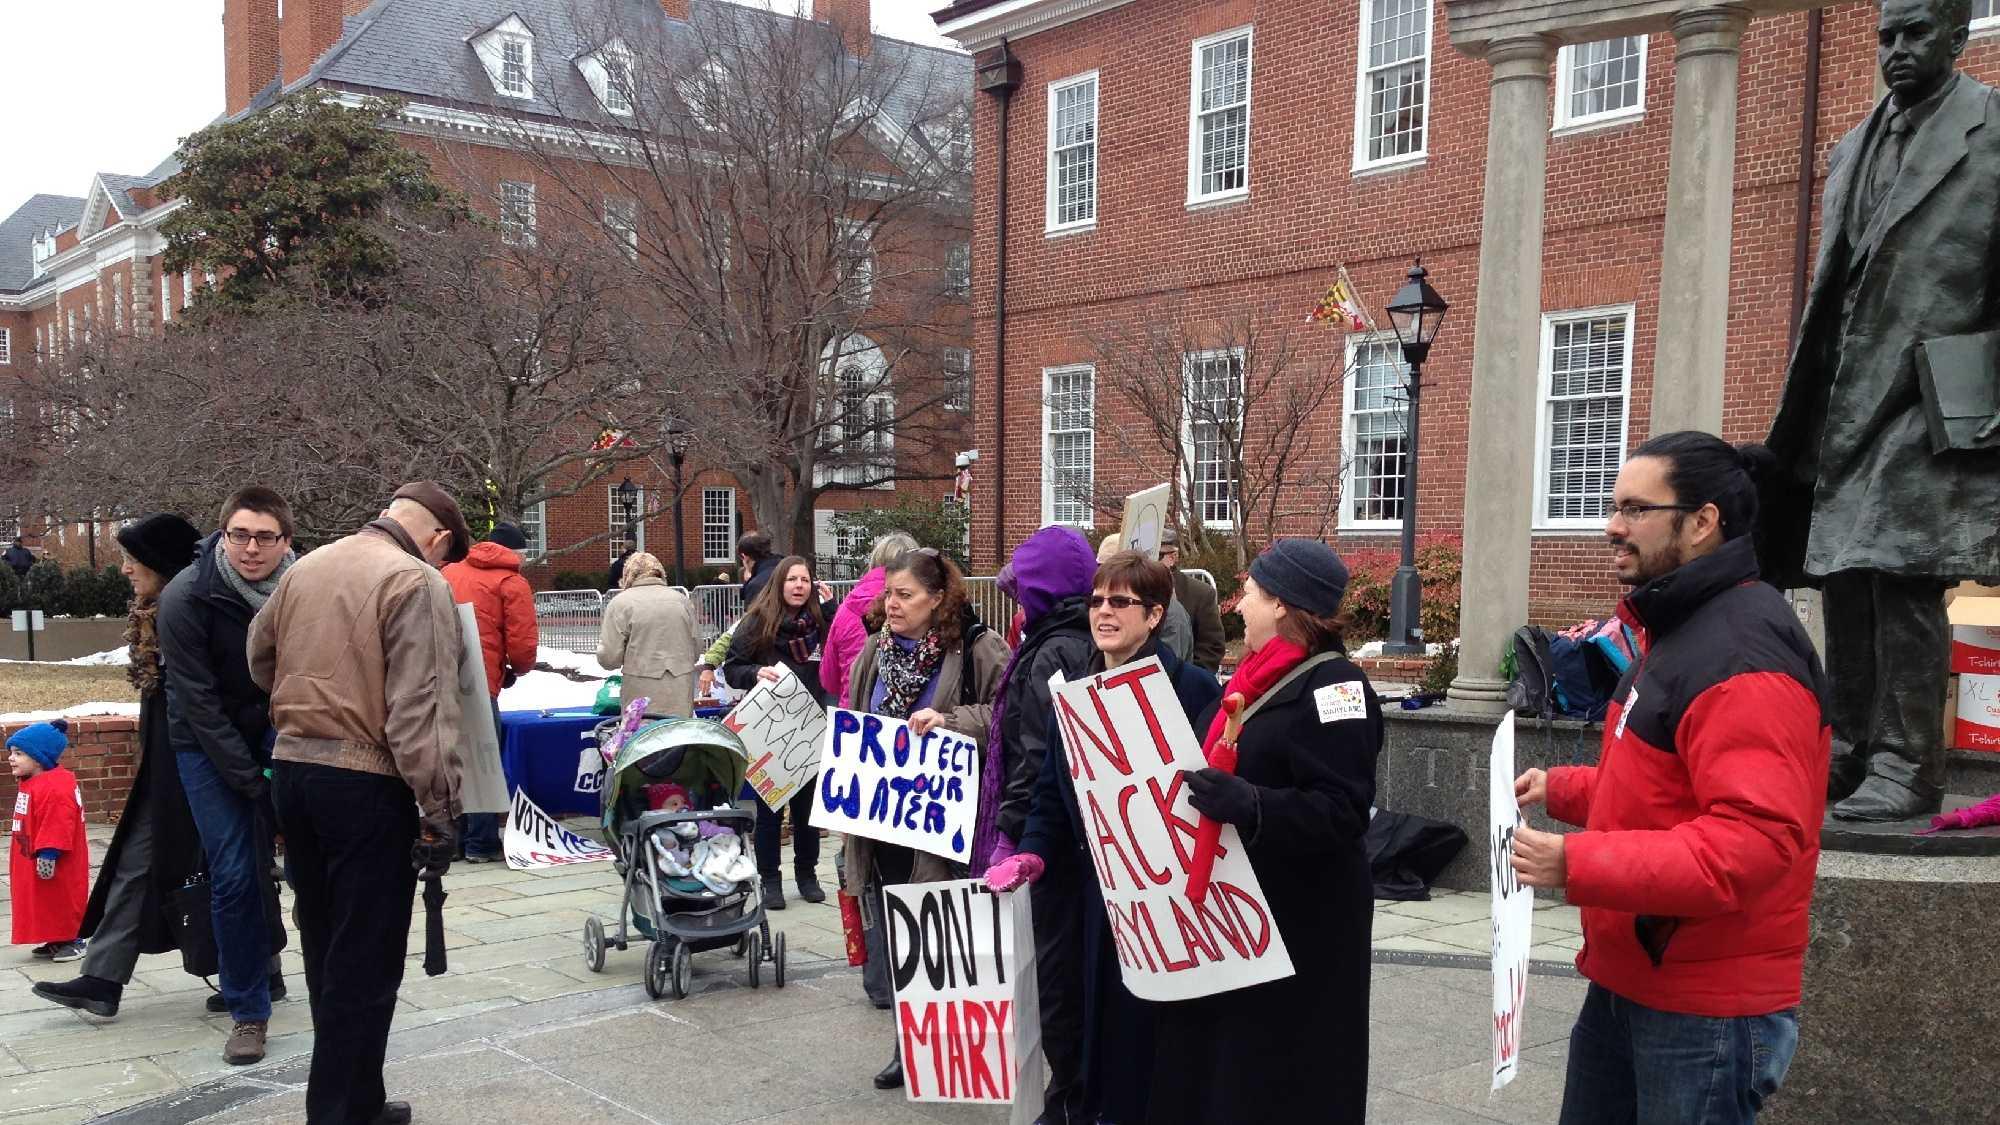 March 3: Anti-fracking demonstration